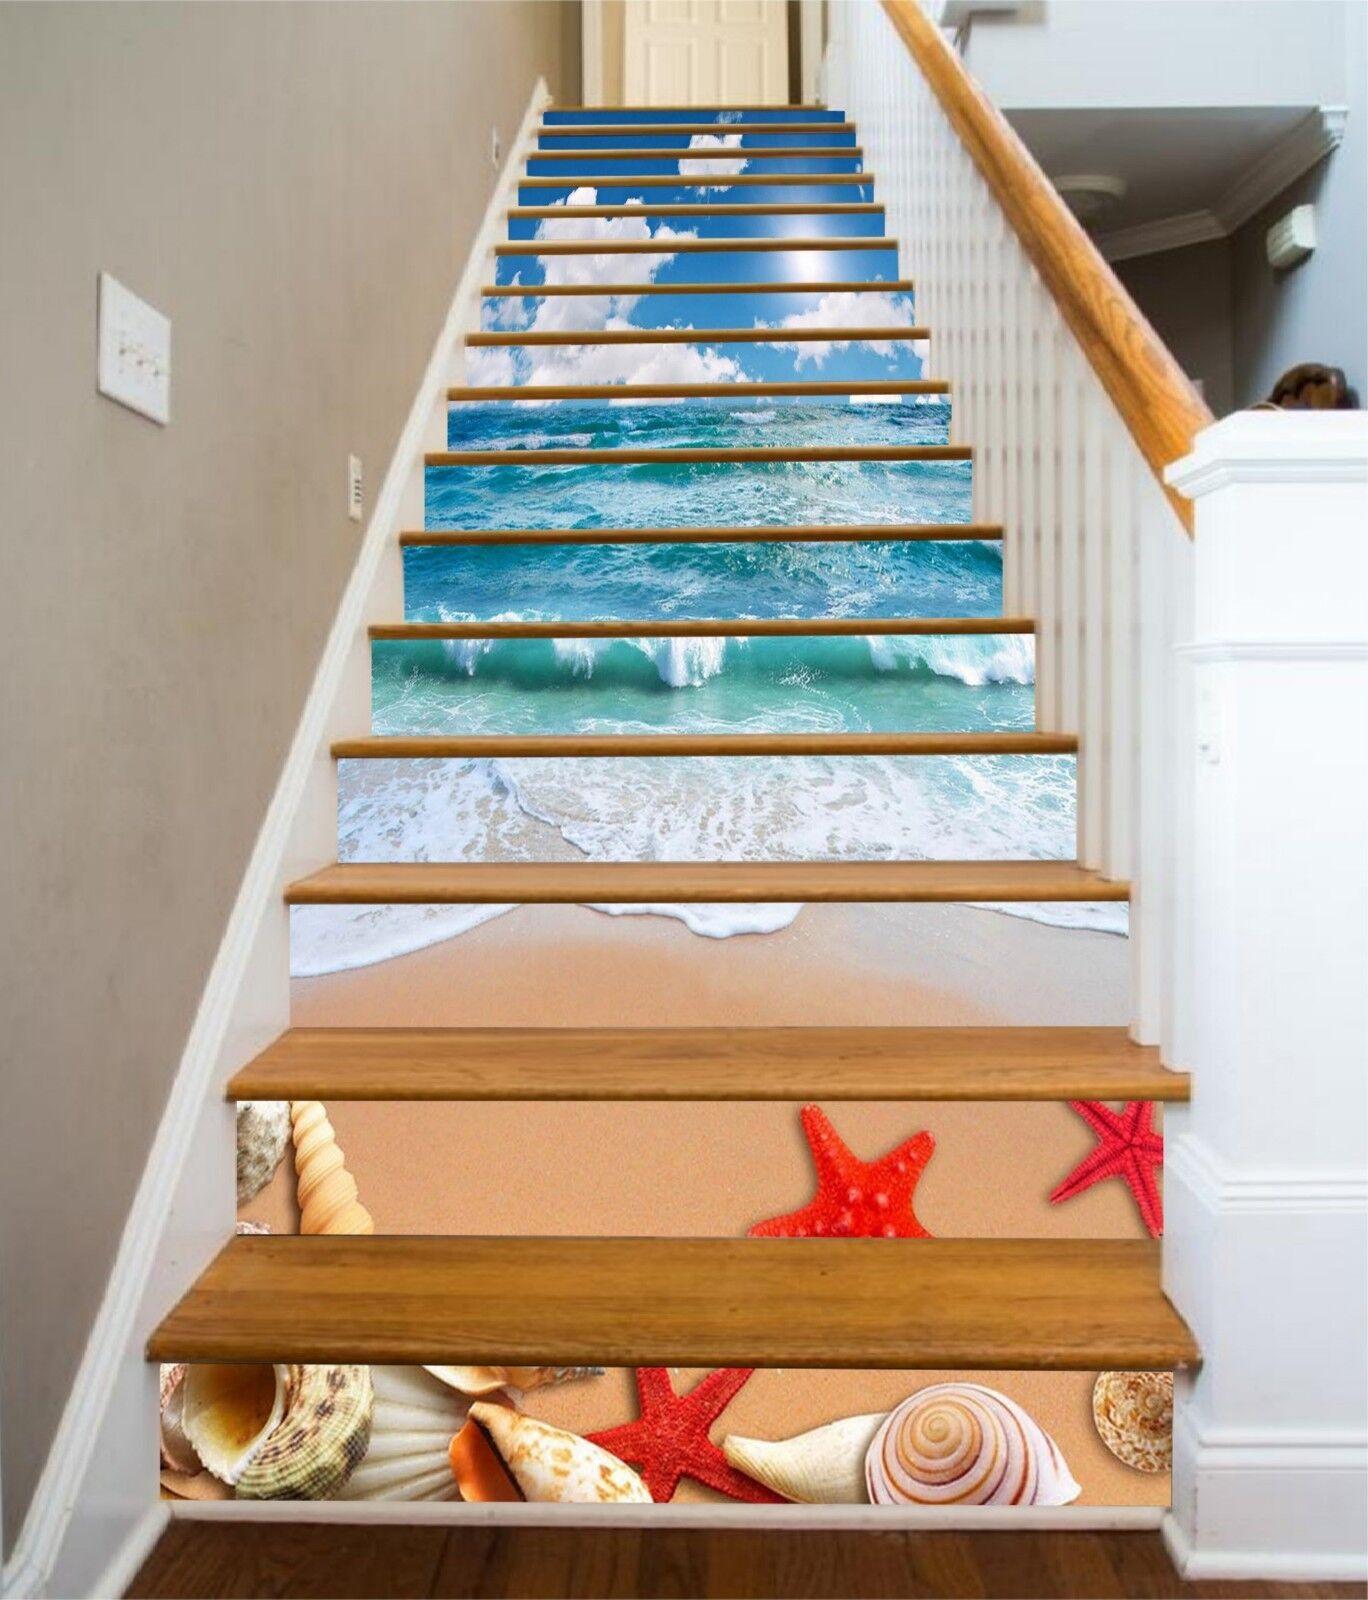 3D Seafish Sea 8 Stair Risers Decoration Photo Mural Vinyl Decal Wallpaper CA